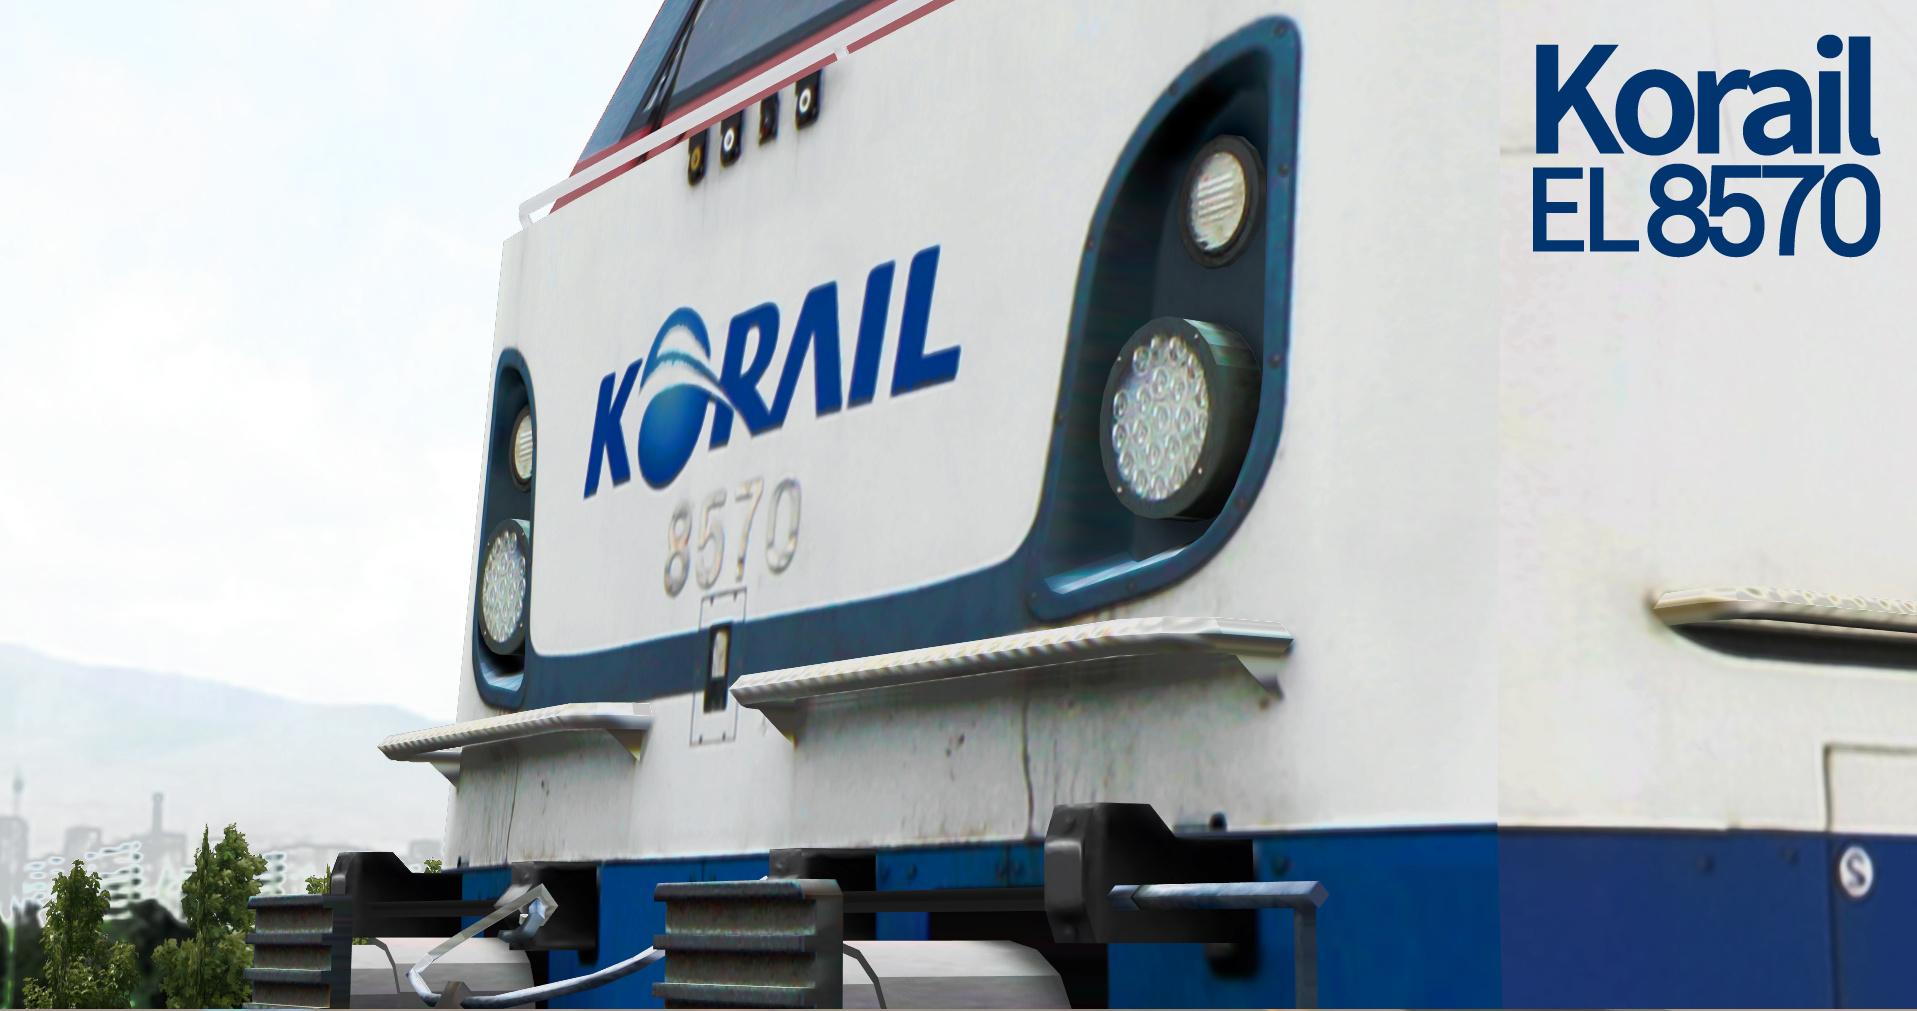 KOREA Electric locomotive 8500 Series Tm610